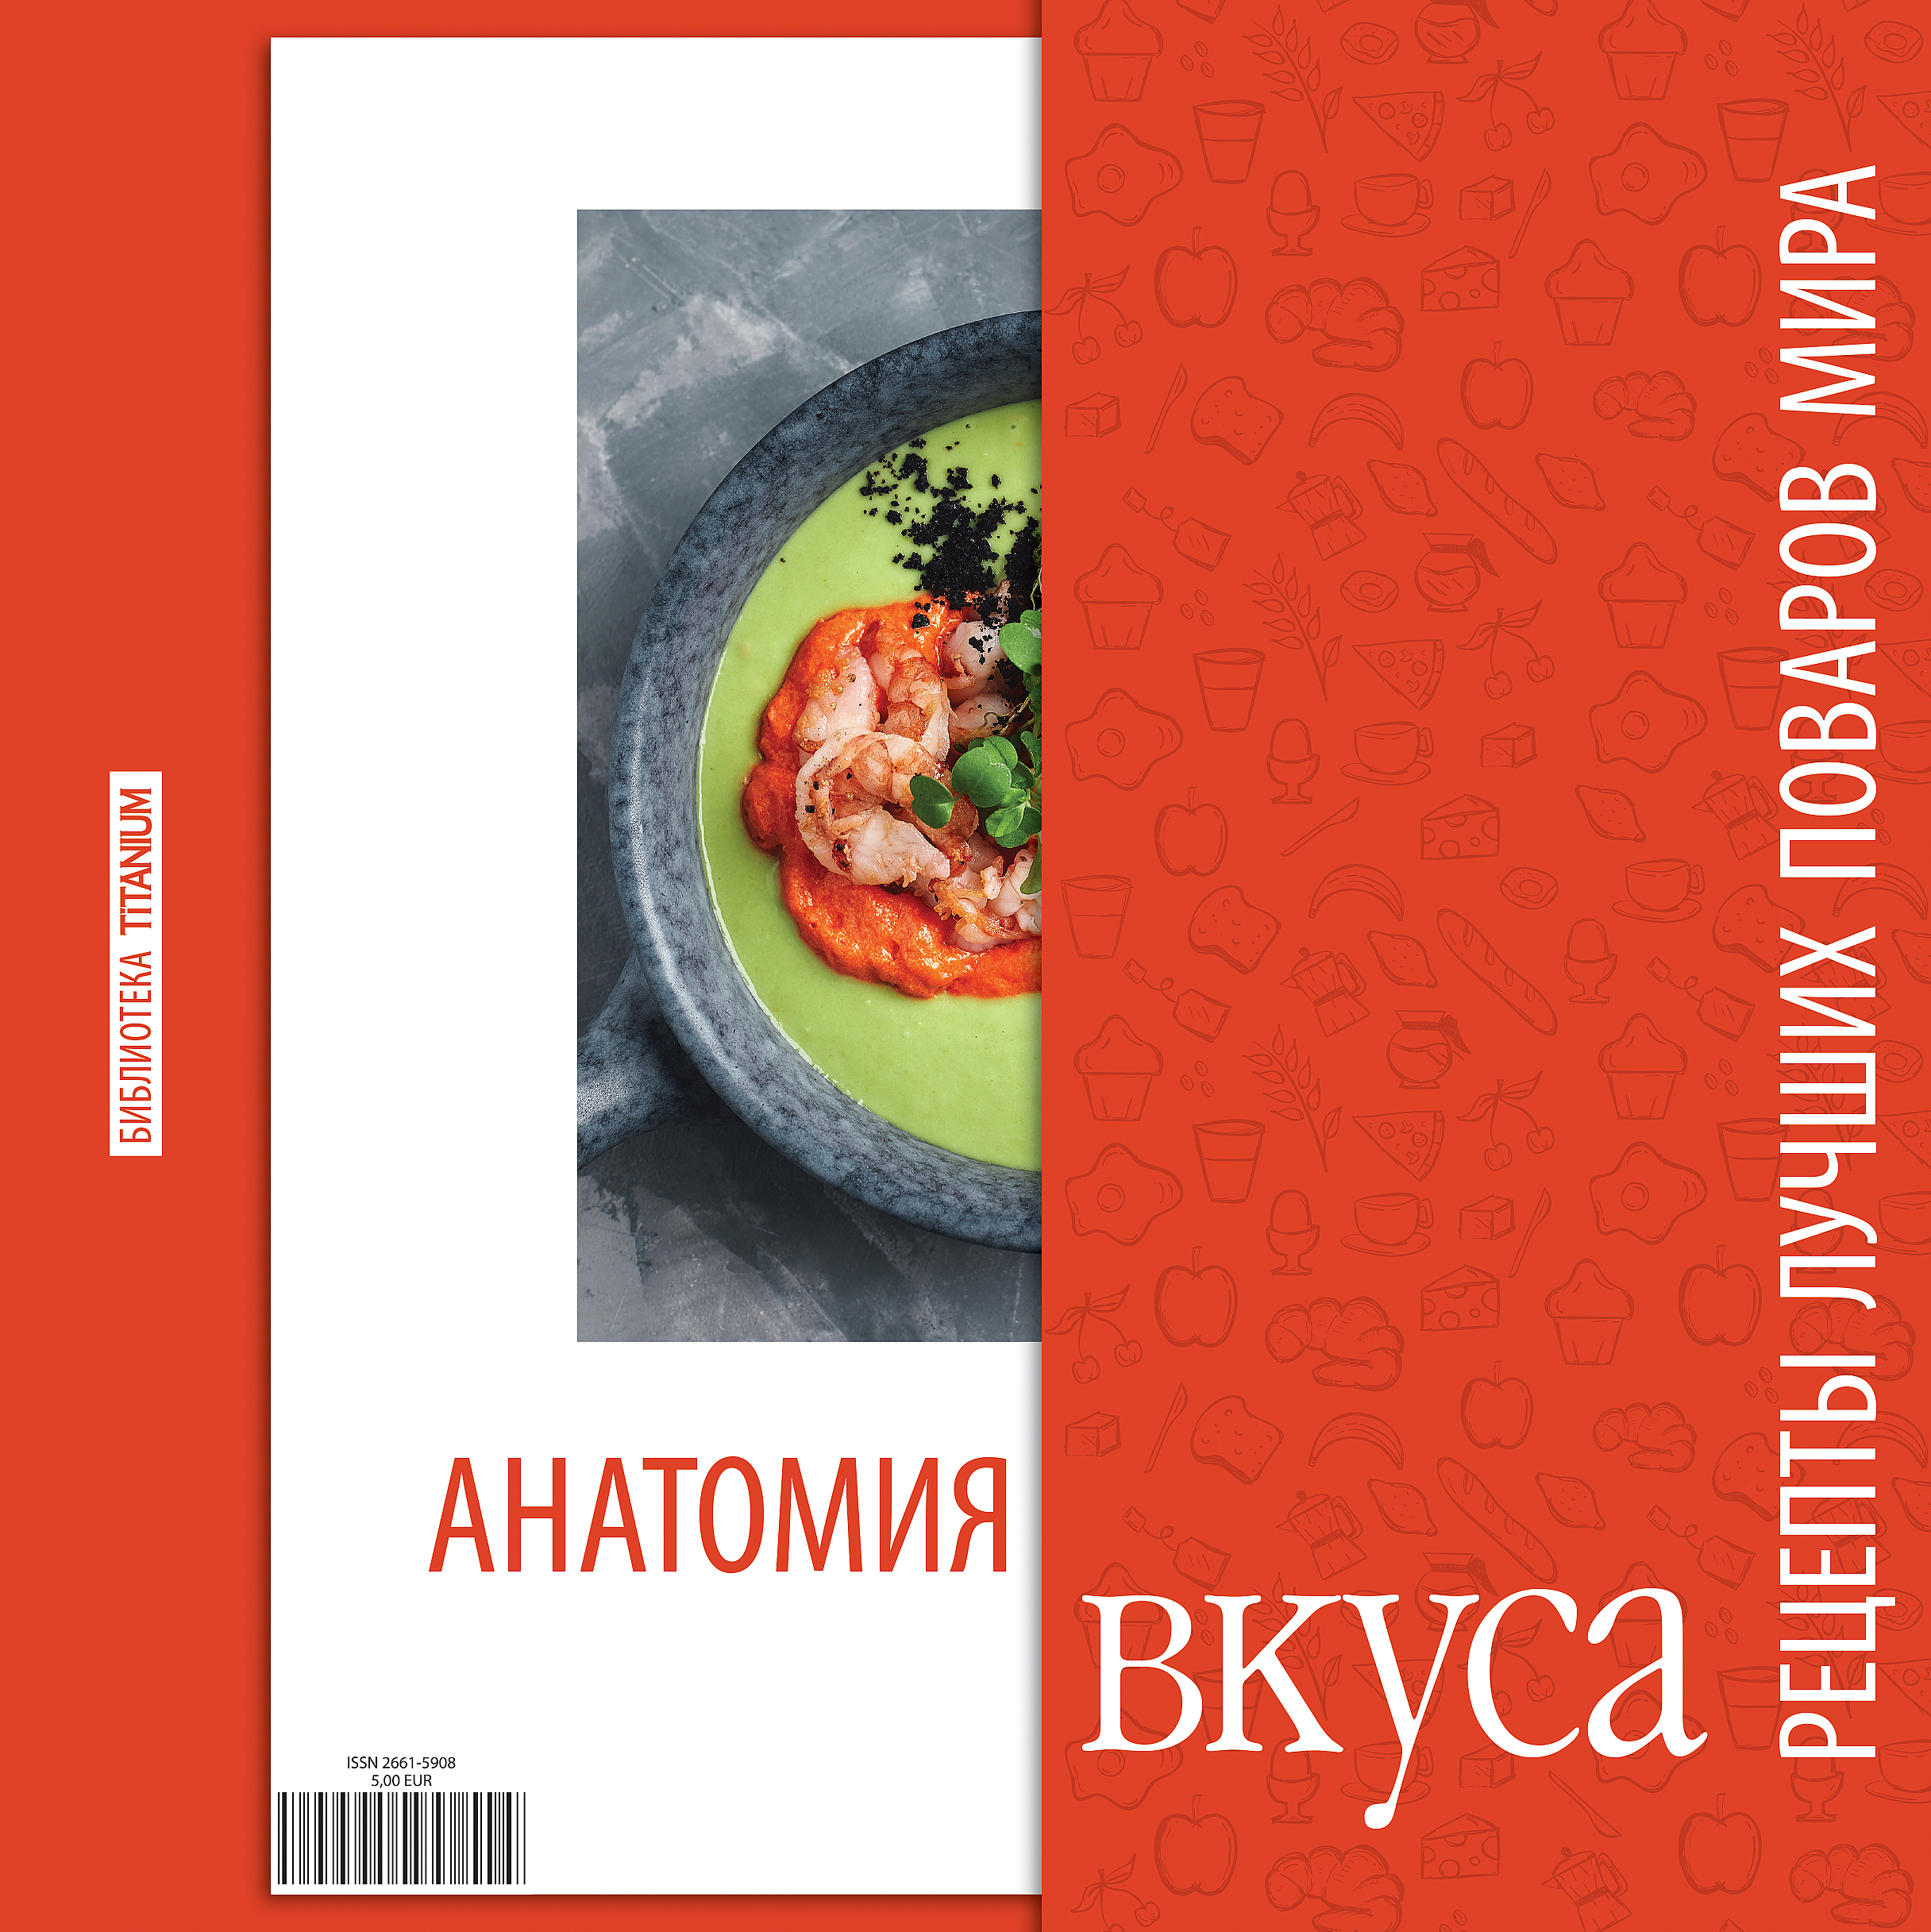 cookbook_cover